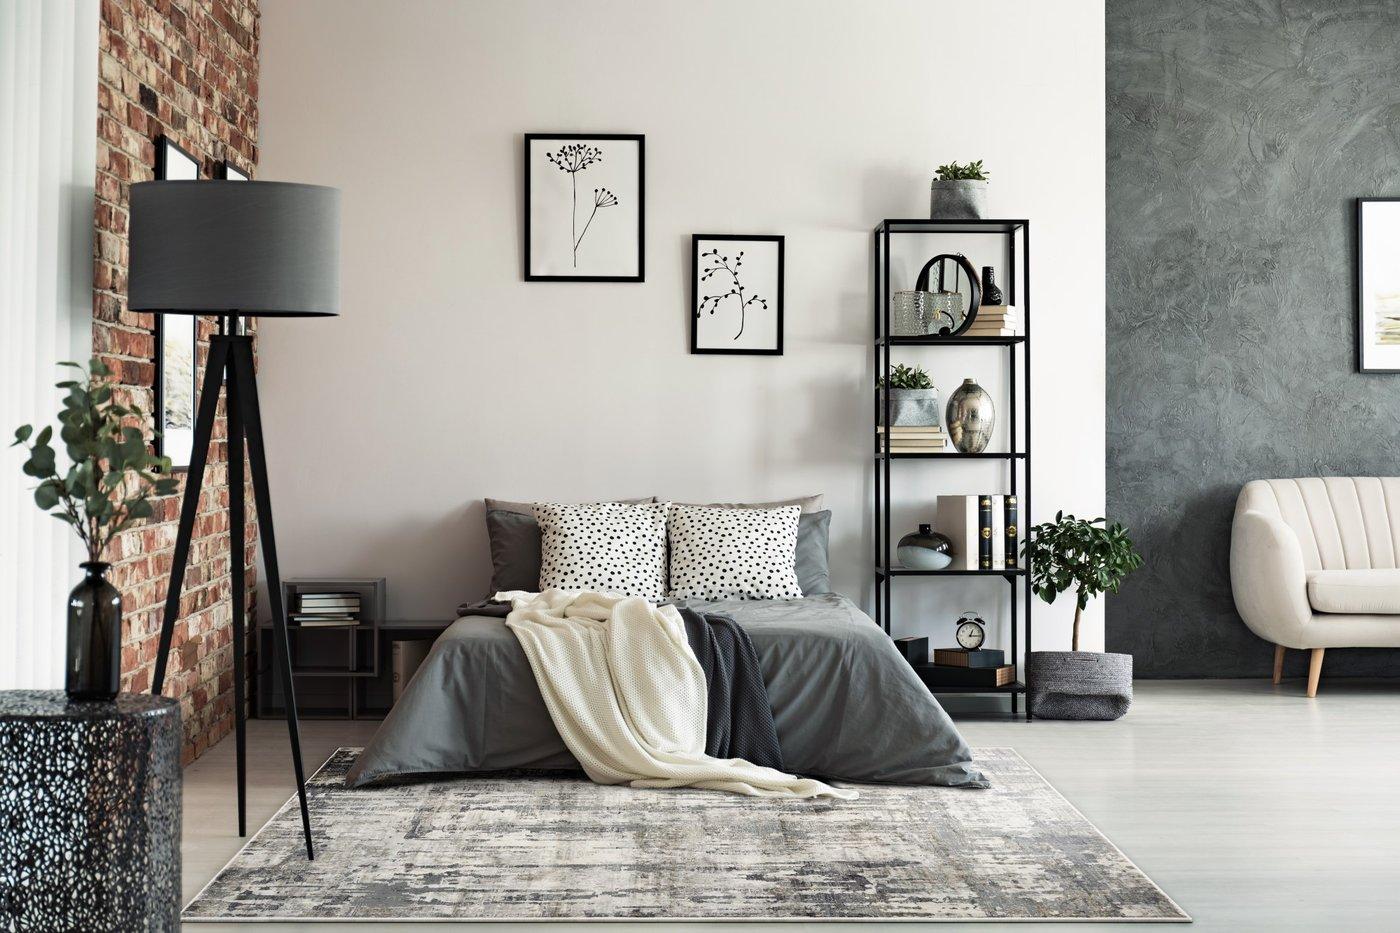 Open Space Bedroom Decor Ideas